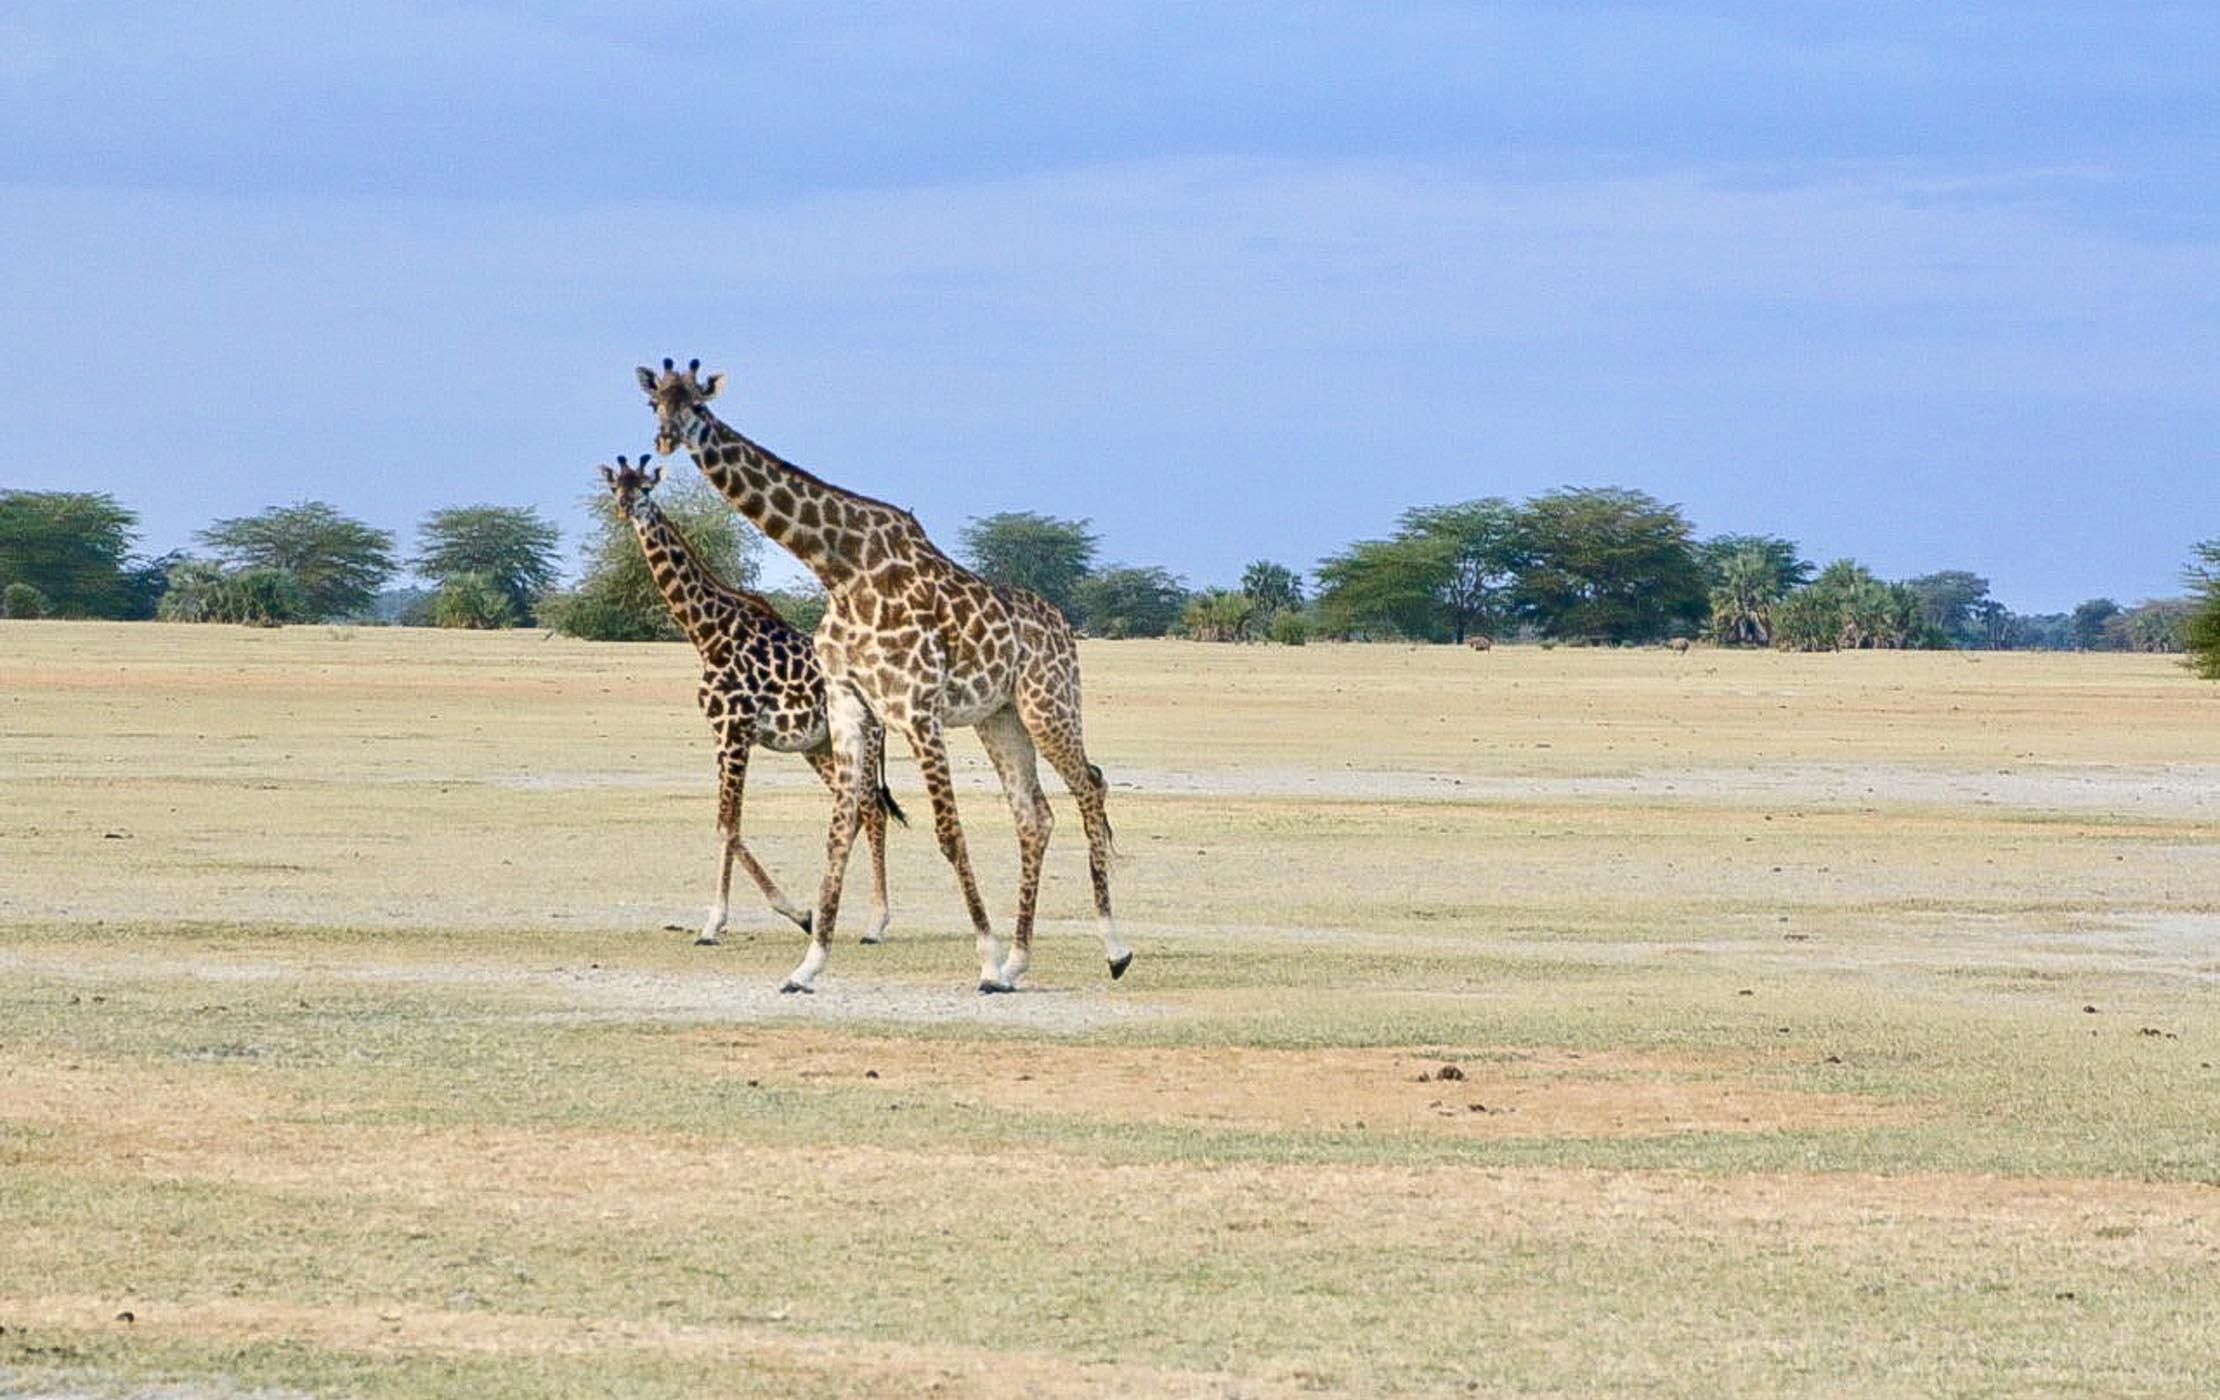 Two giraffes walk through a field